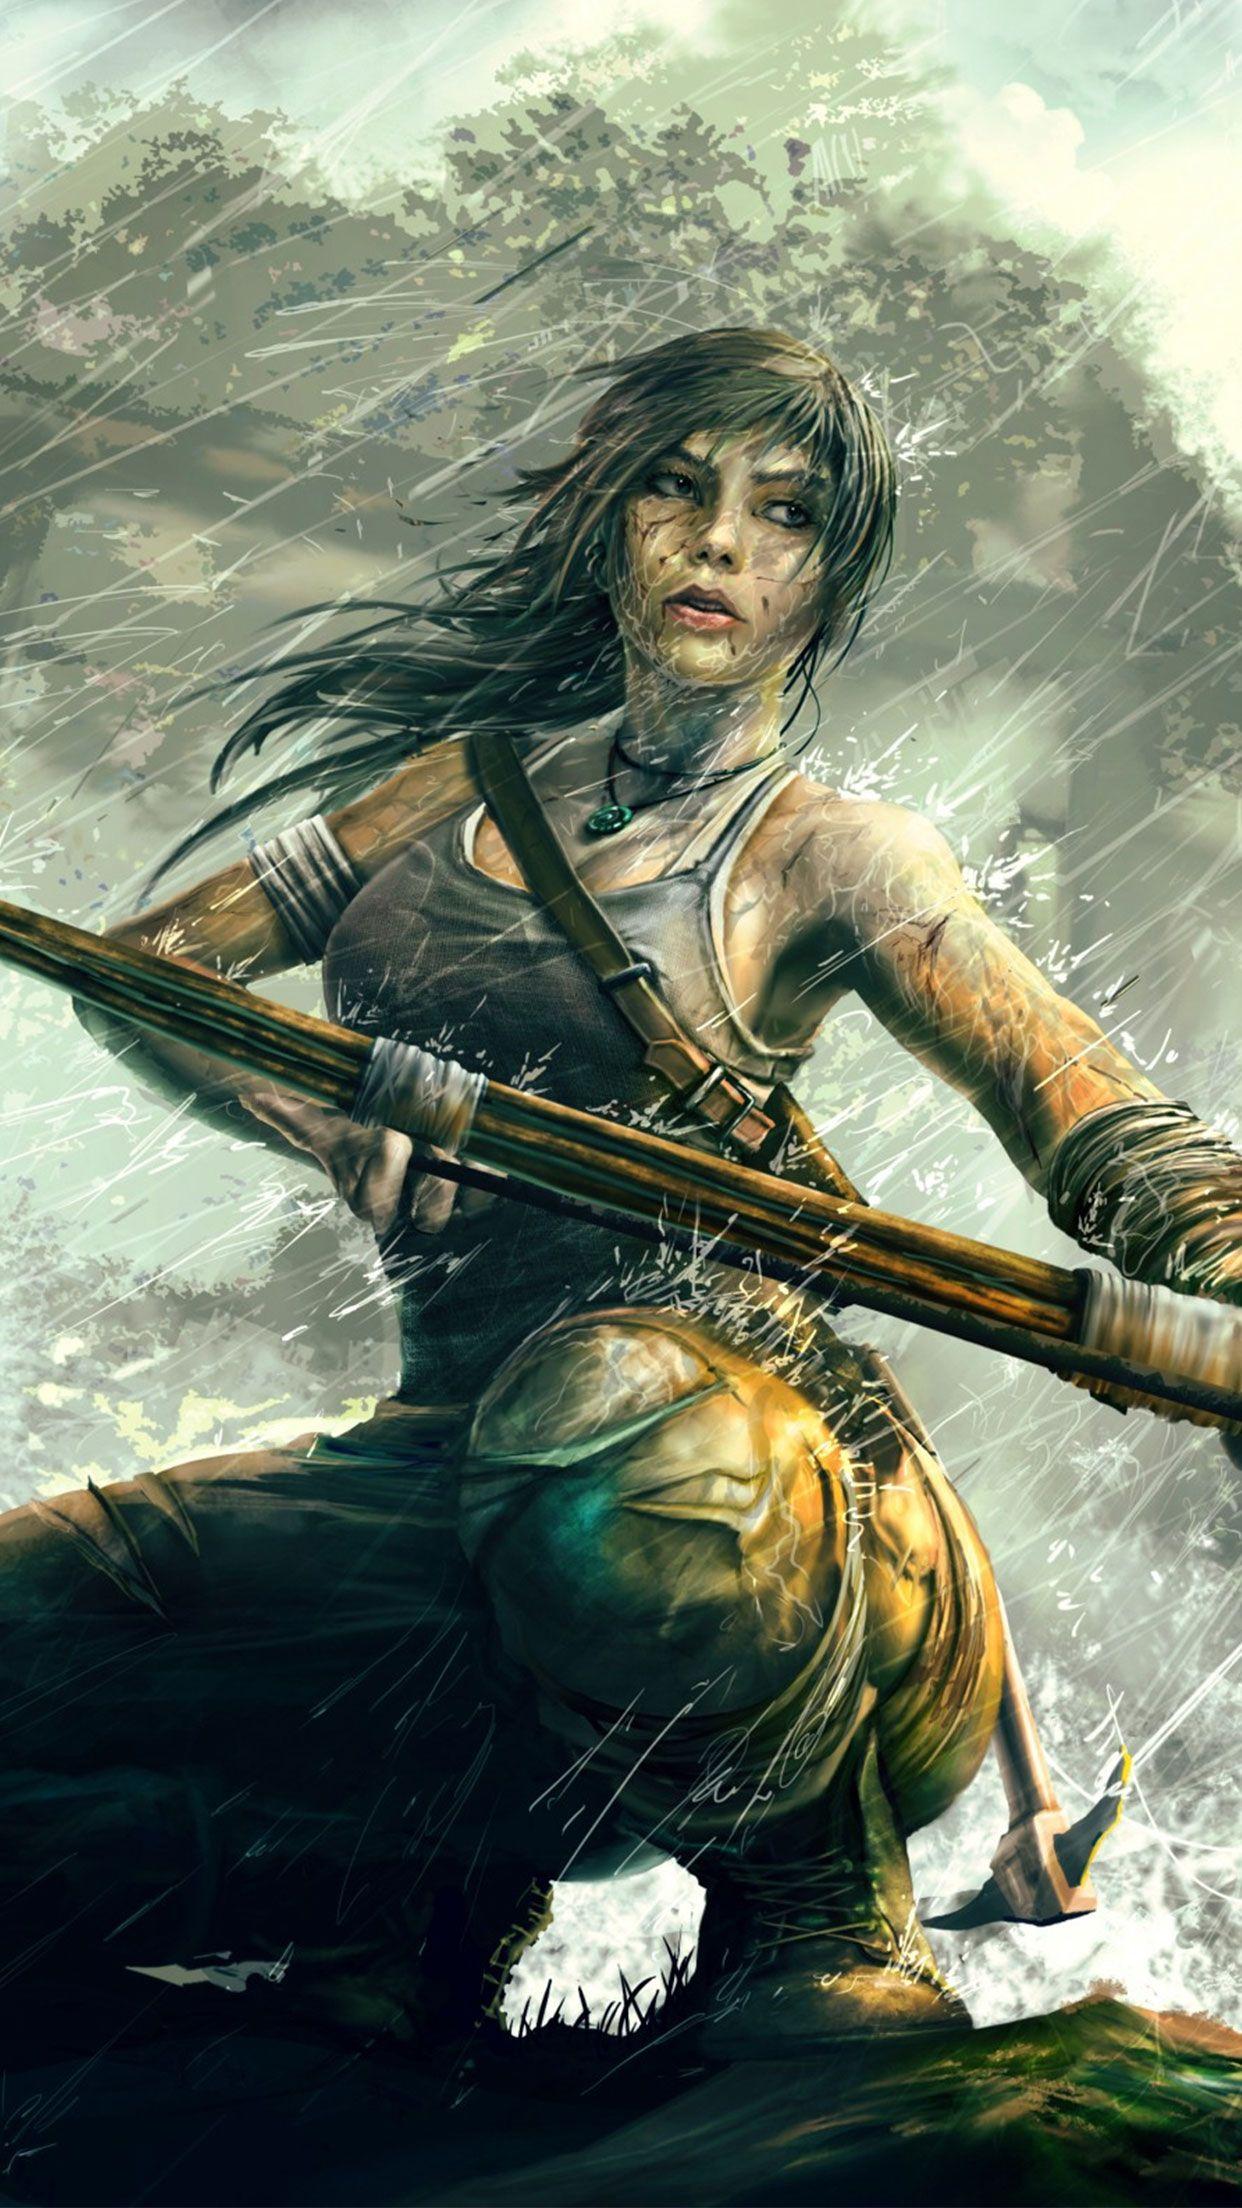 Tomb Raider Lara Croft Game Wallpaper For Iphone Android Tombraider Laracroft Game Wallpaper Che Tomb Raider Lara Croft Tomb Raider Wallpaper Tomb Raider